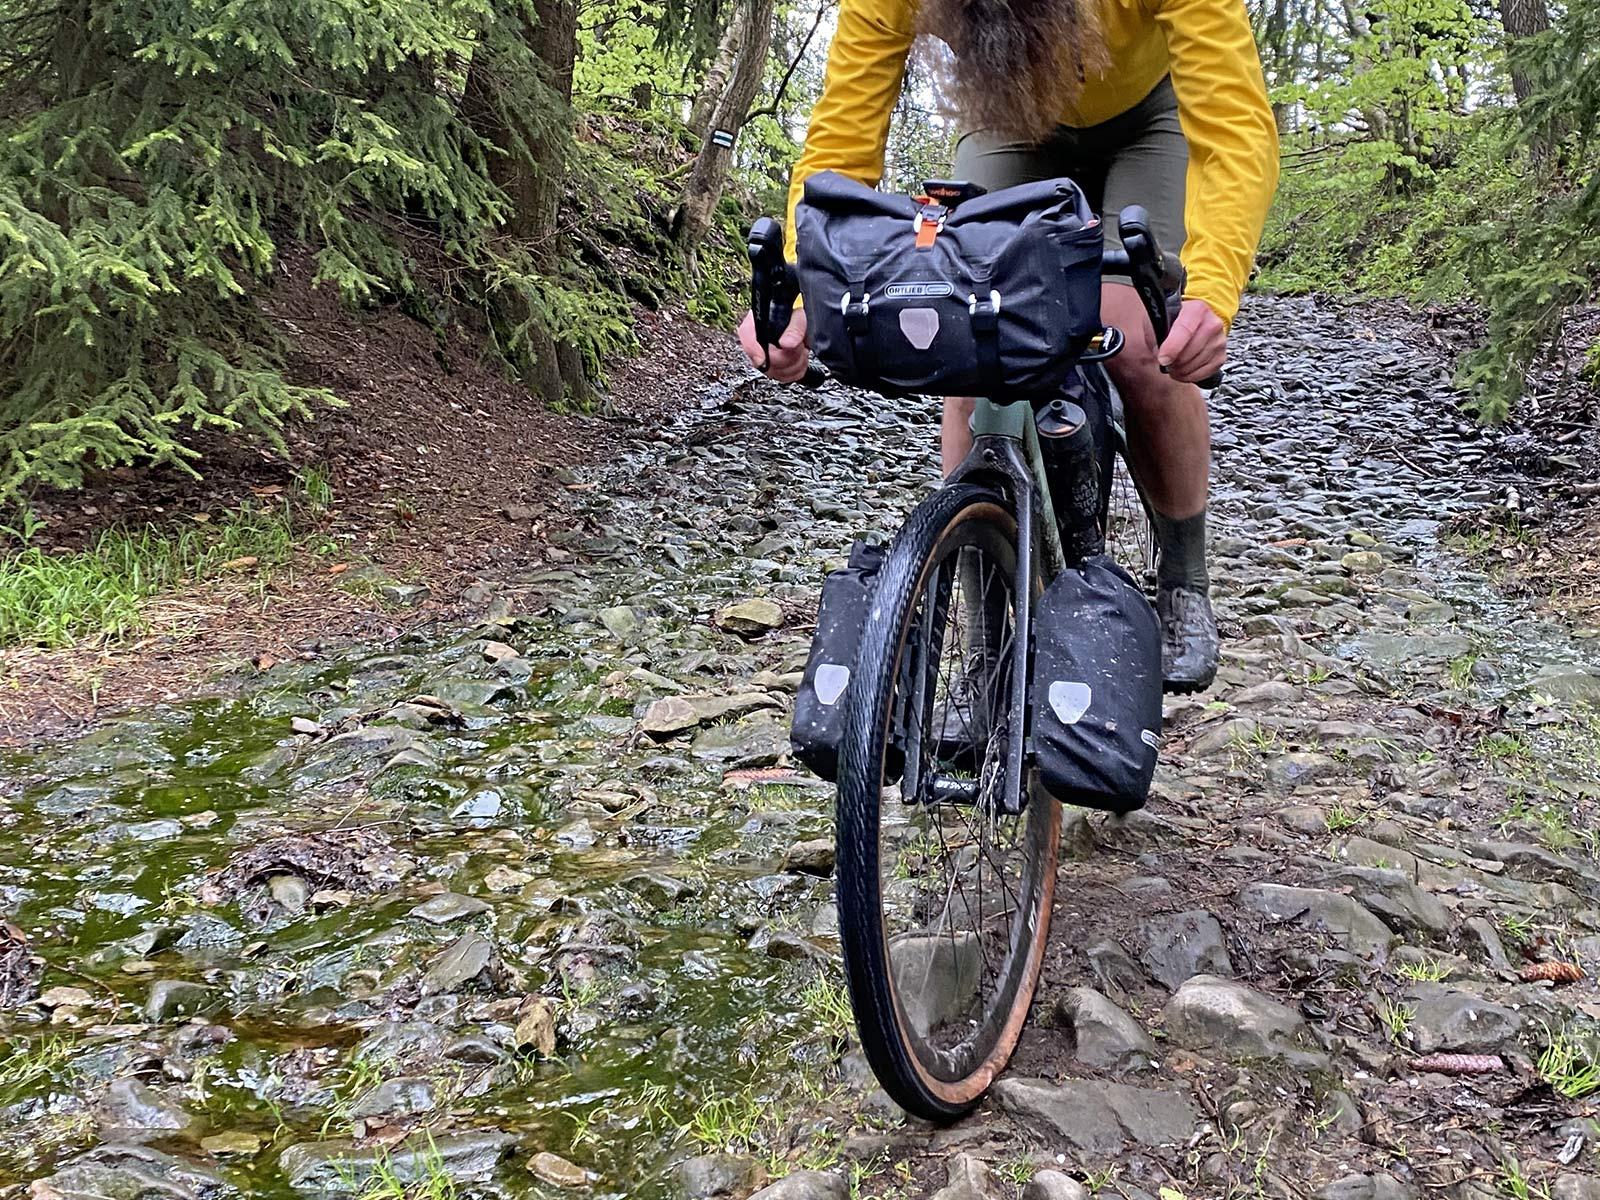 Ortlieb Handlebar Pack QR, made-in-Germany waterproof quick release 11L bikepacking bar bag,rocky off-road